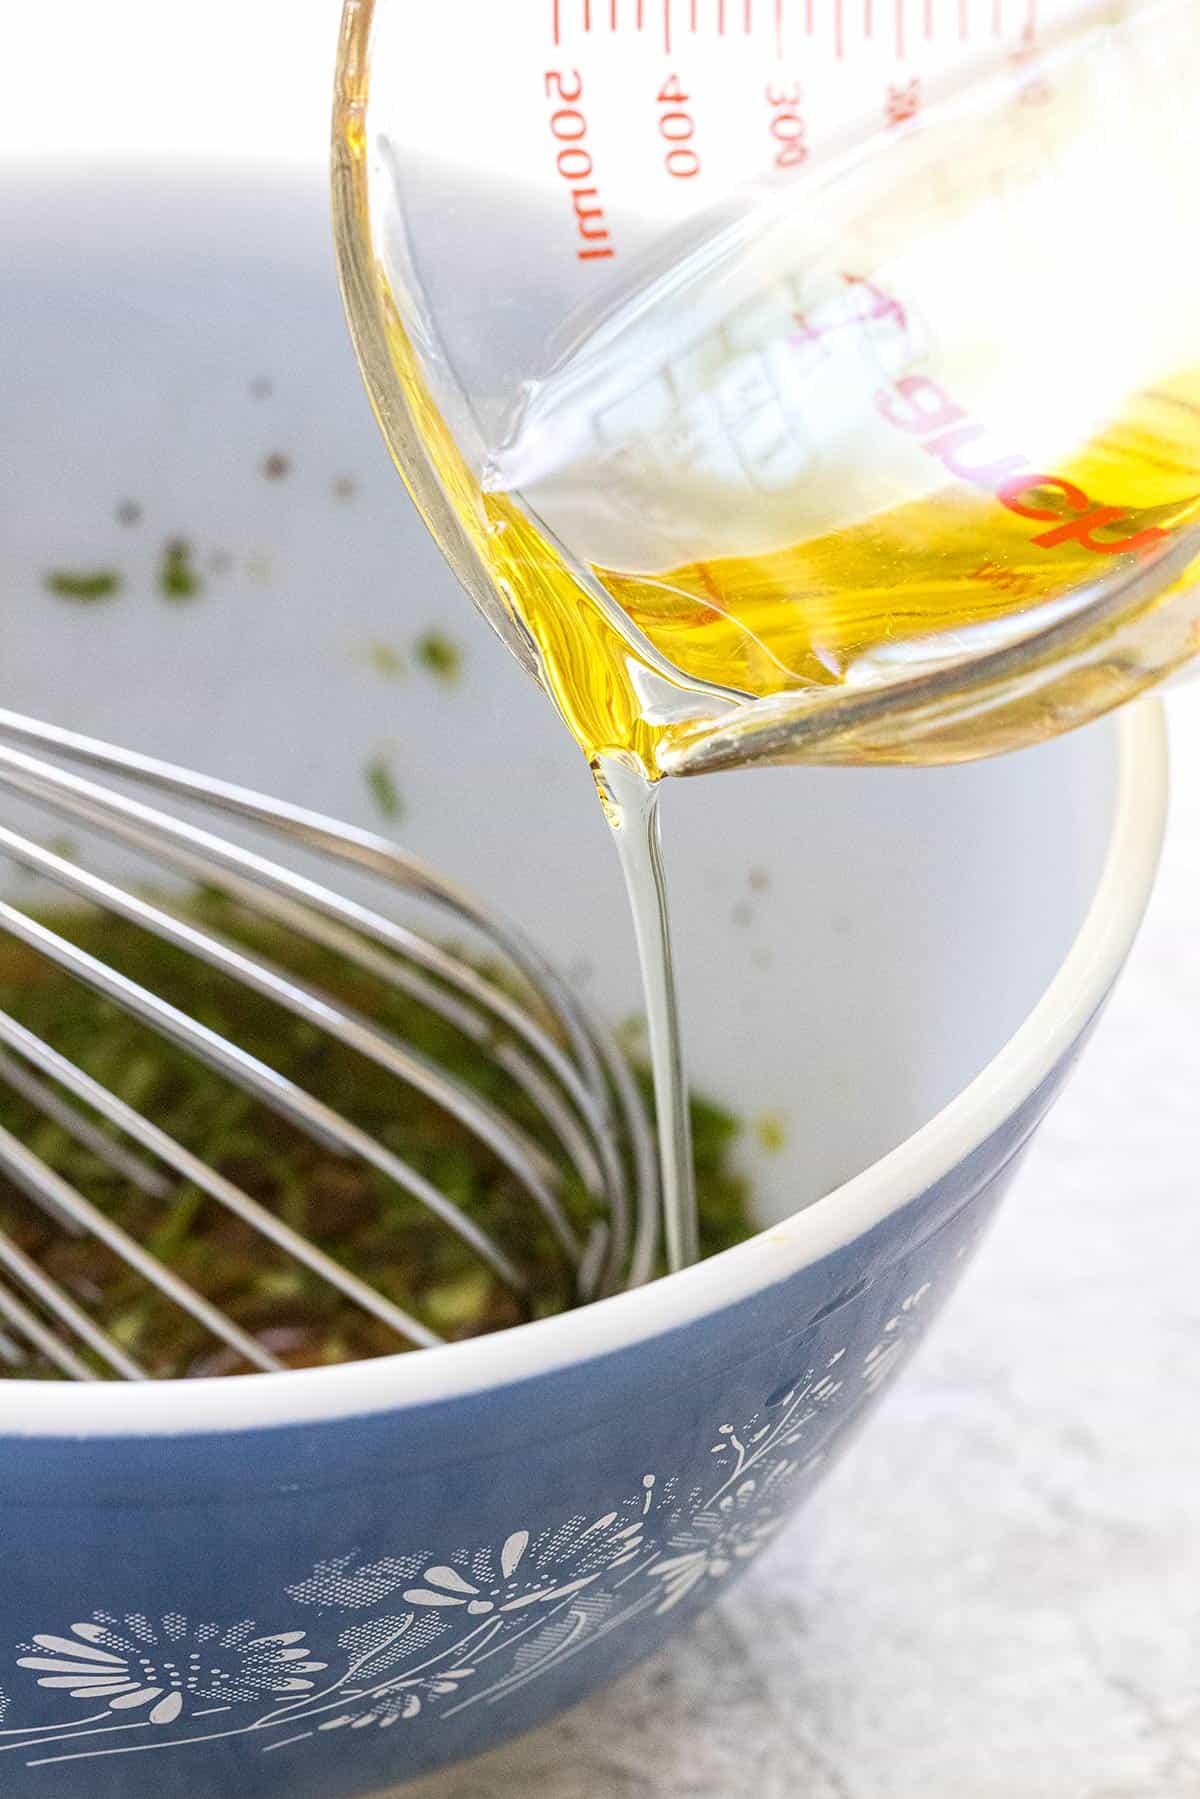 pouring avocado oil into a bowl of salad dressing